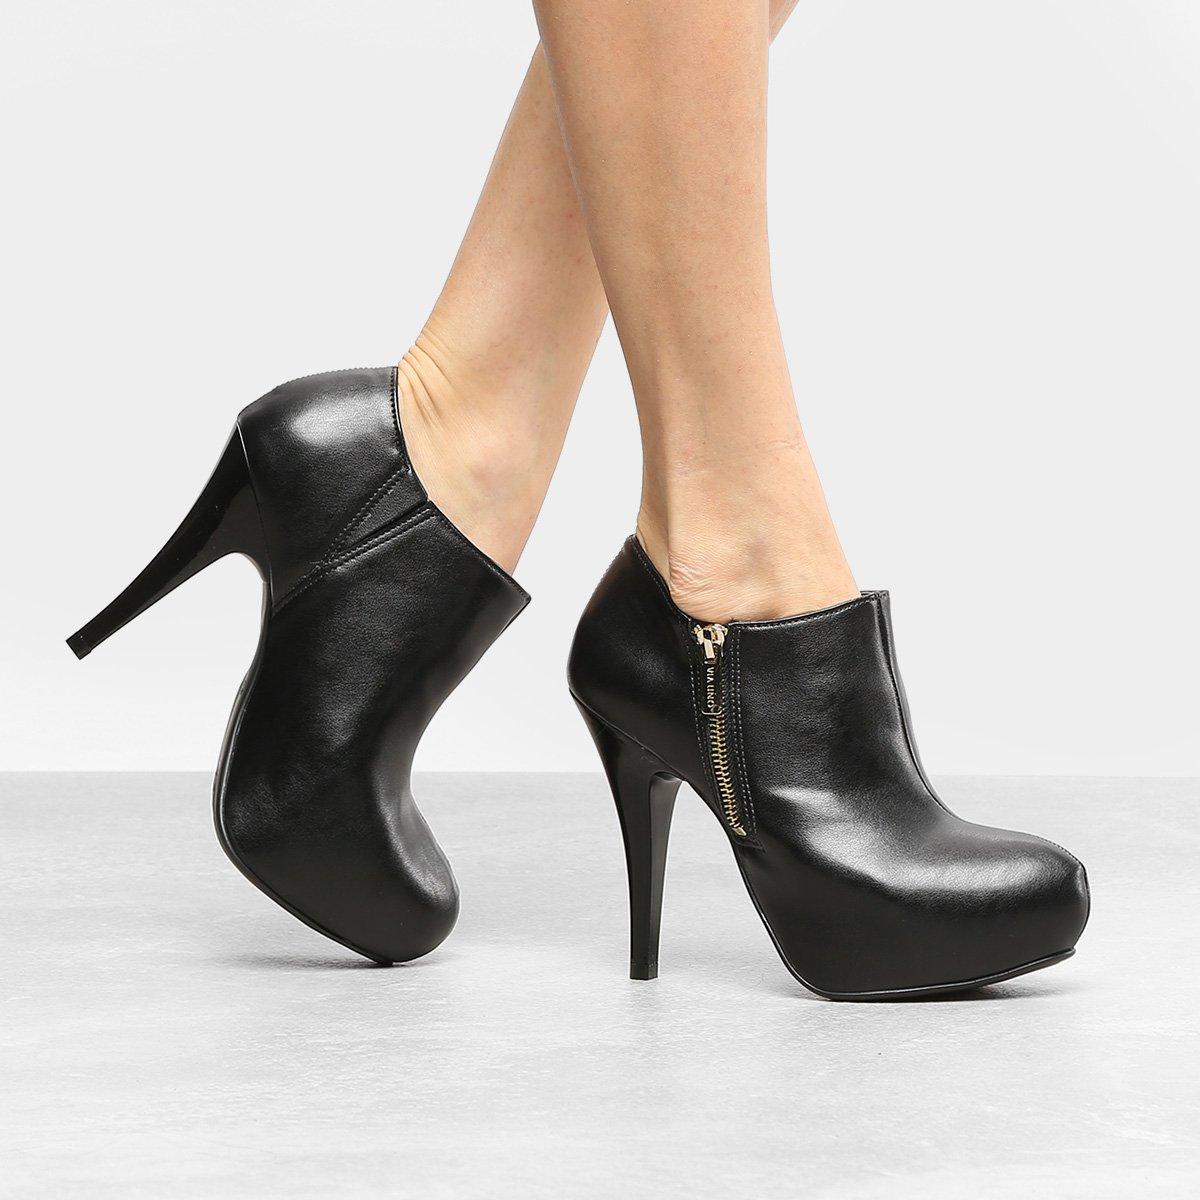 e7fd02ea55 Ankle Boot Via Uno Salto Fino com Meia Pata - Compre Agora